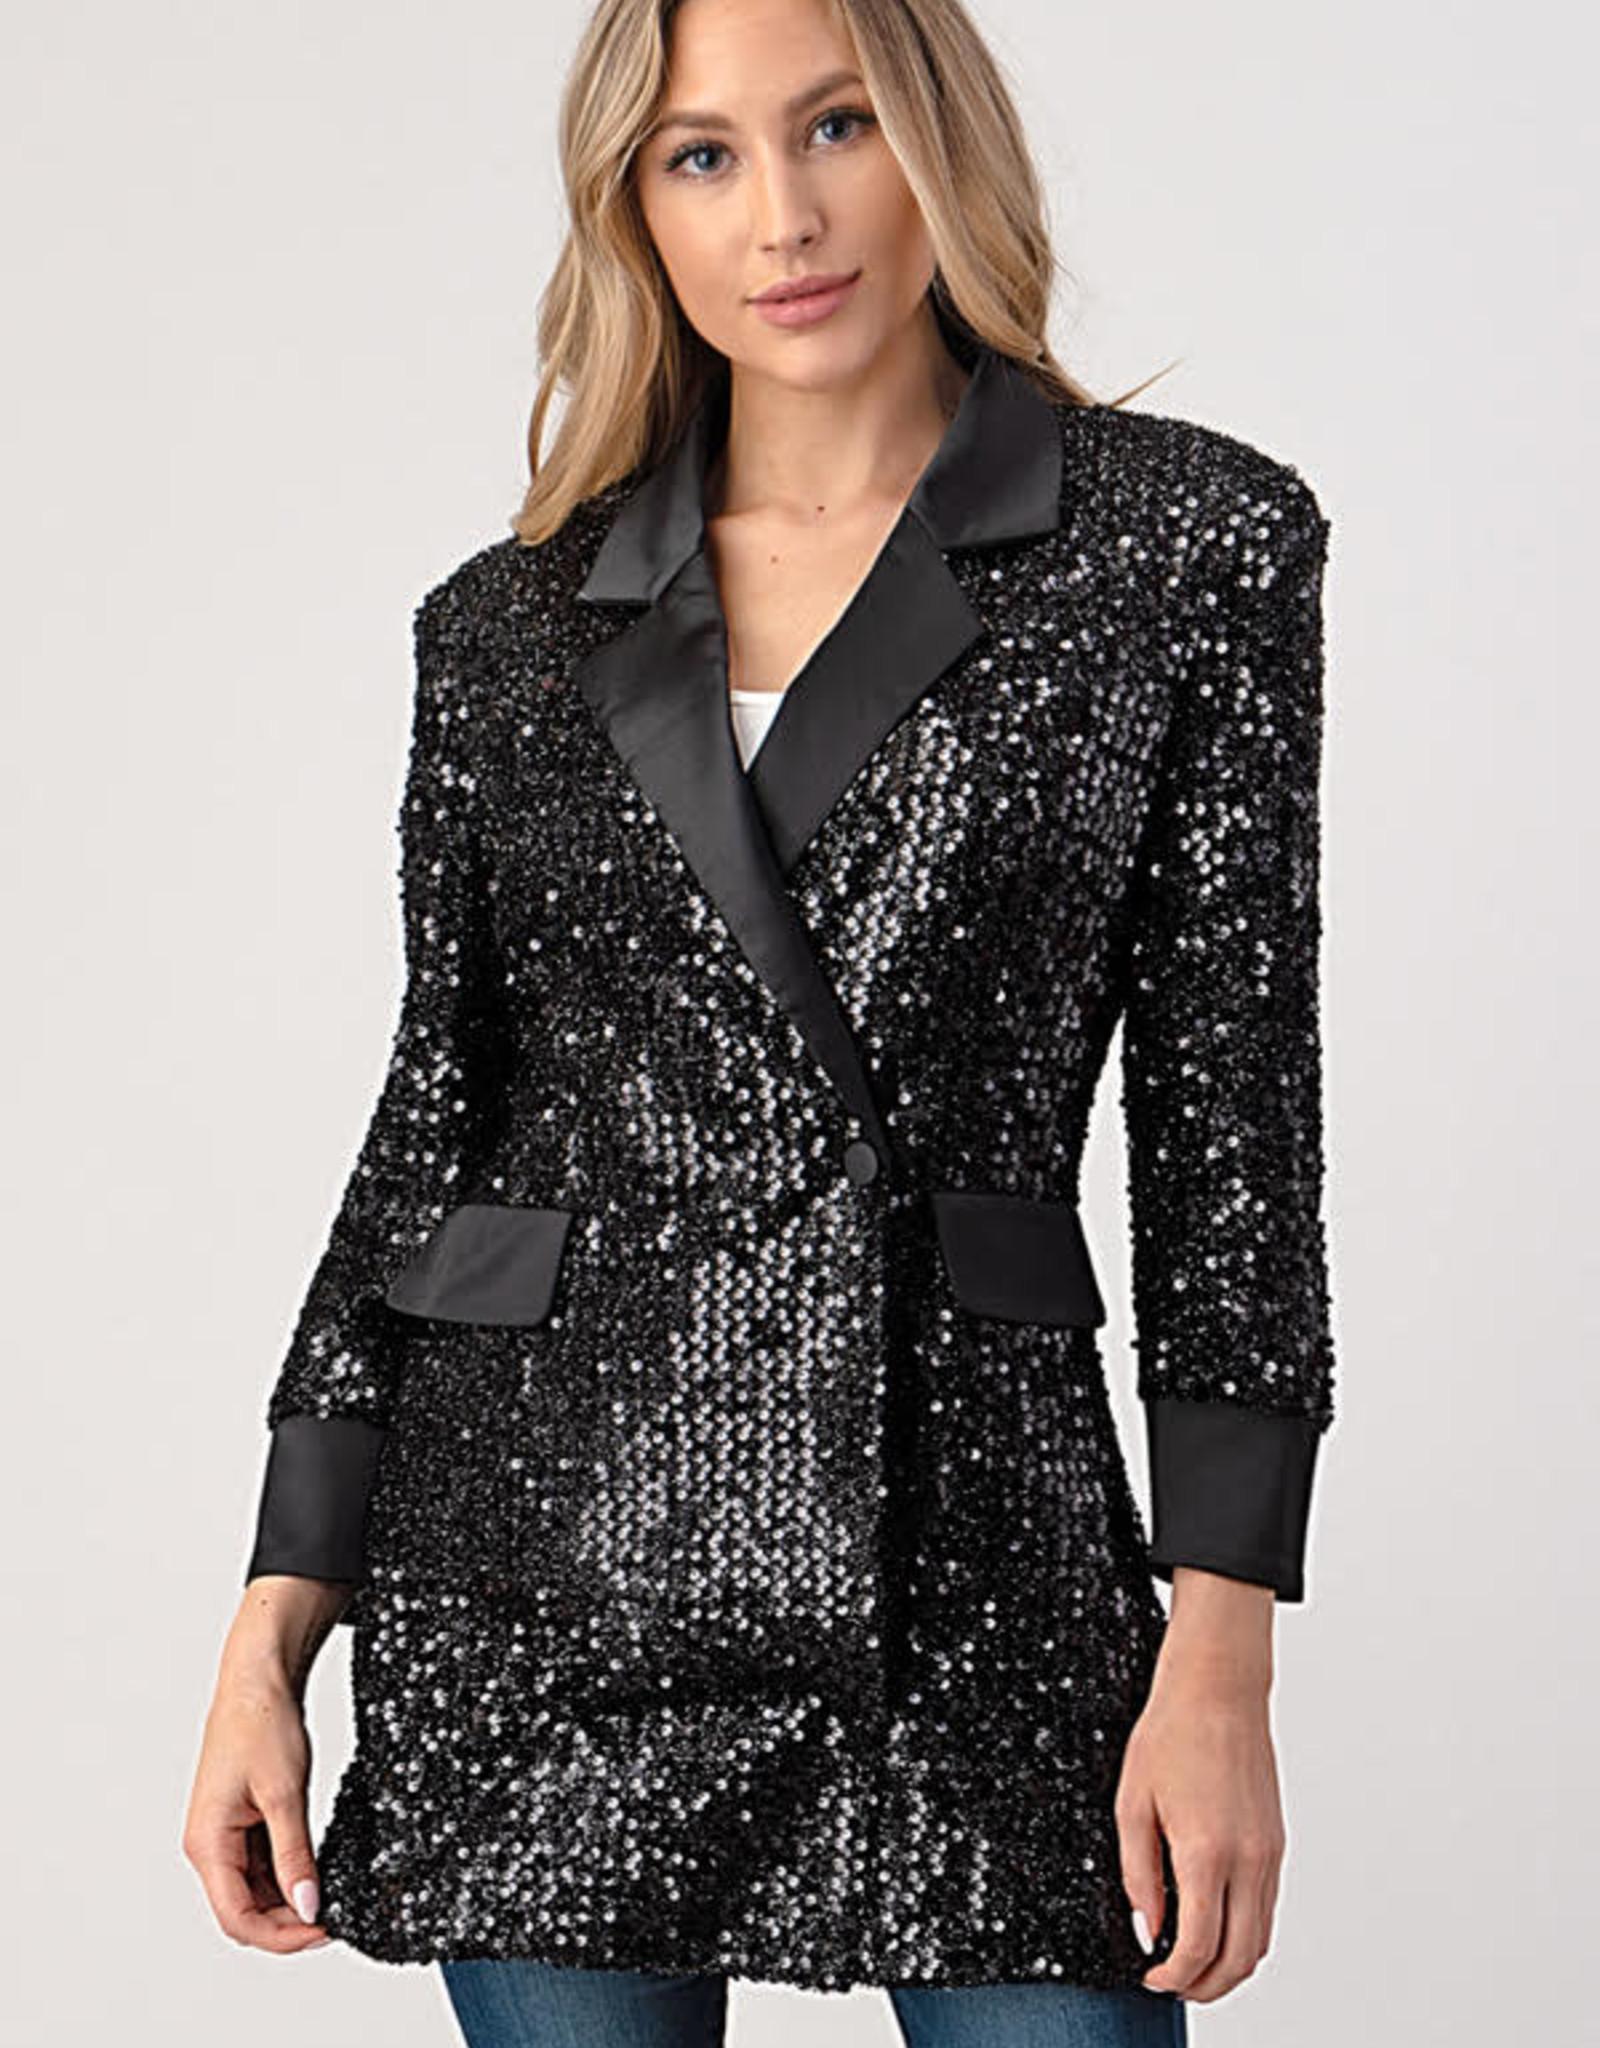 Minuet Black Sequin Tux Dress